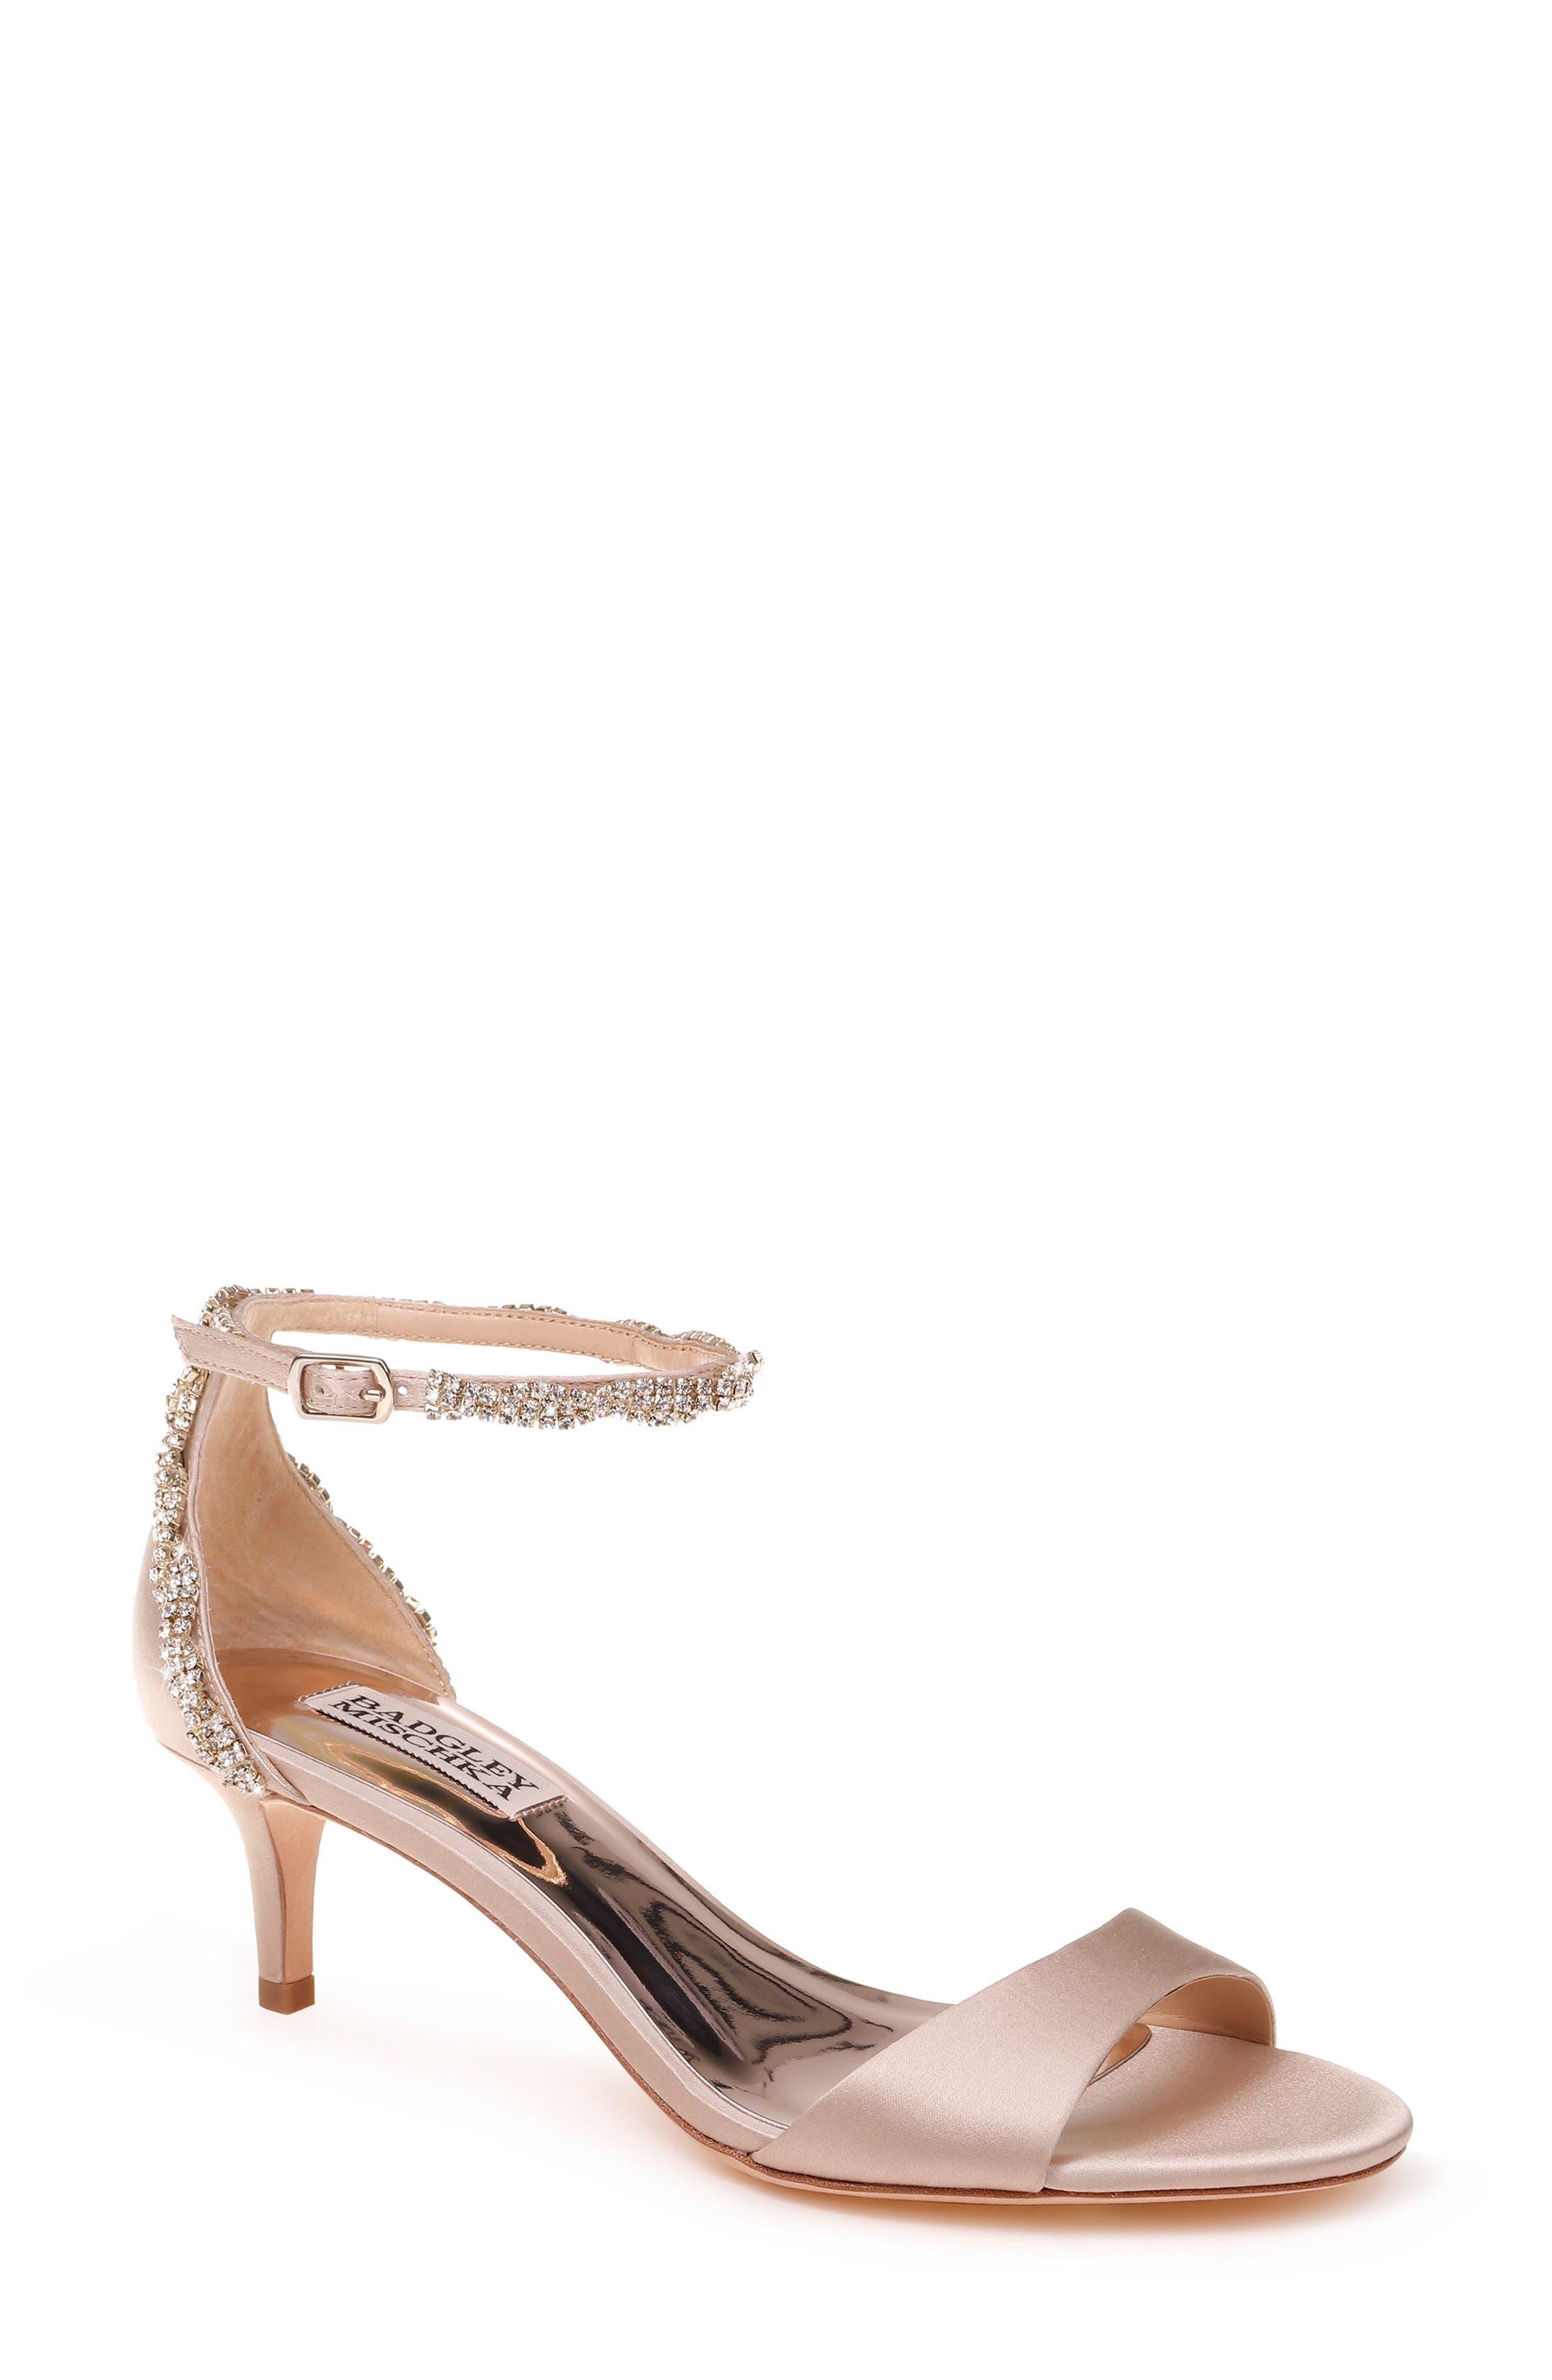 Yareli Crystal Embellished Sandal,                             Main thumbnail 1, color,                             NUDE SATIN